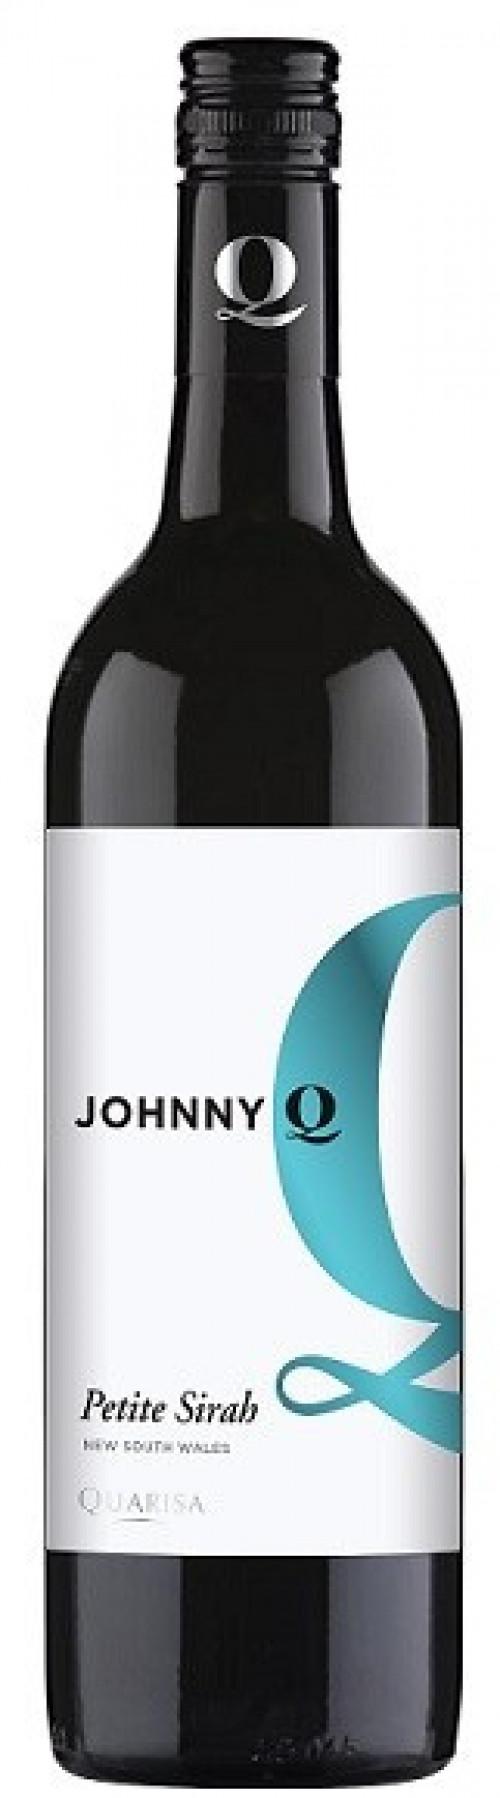 Johnny Q Petite Sirah 750ml